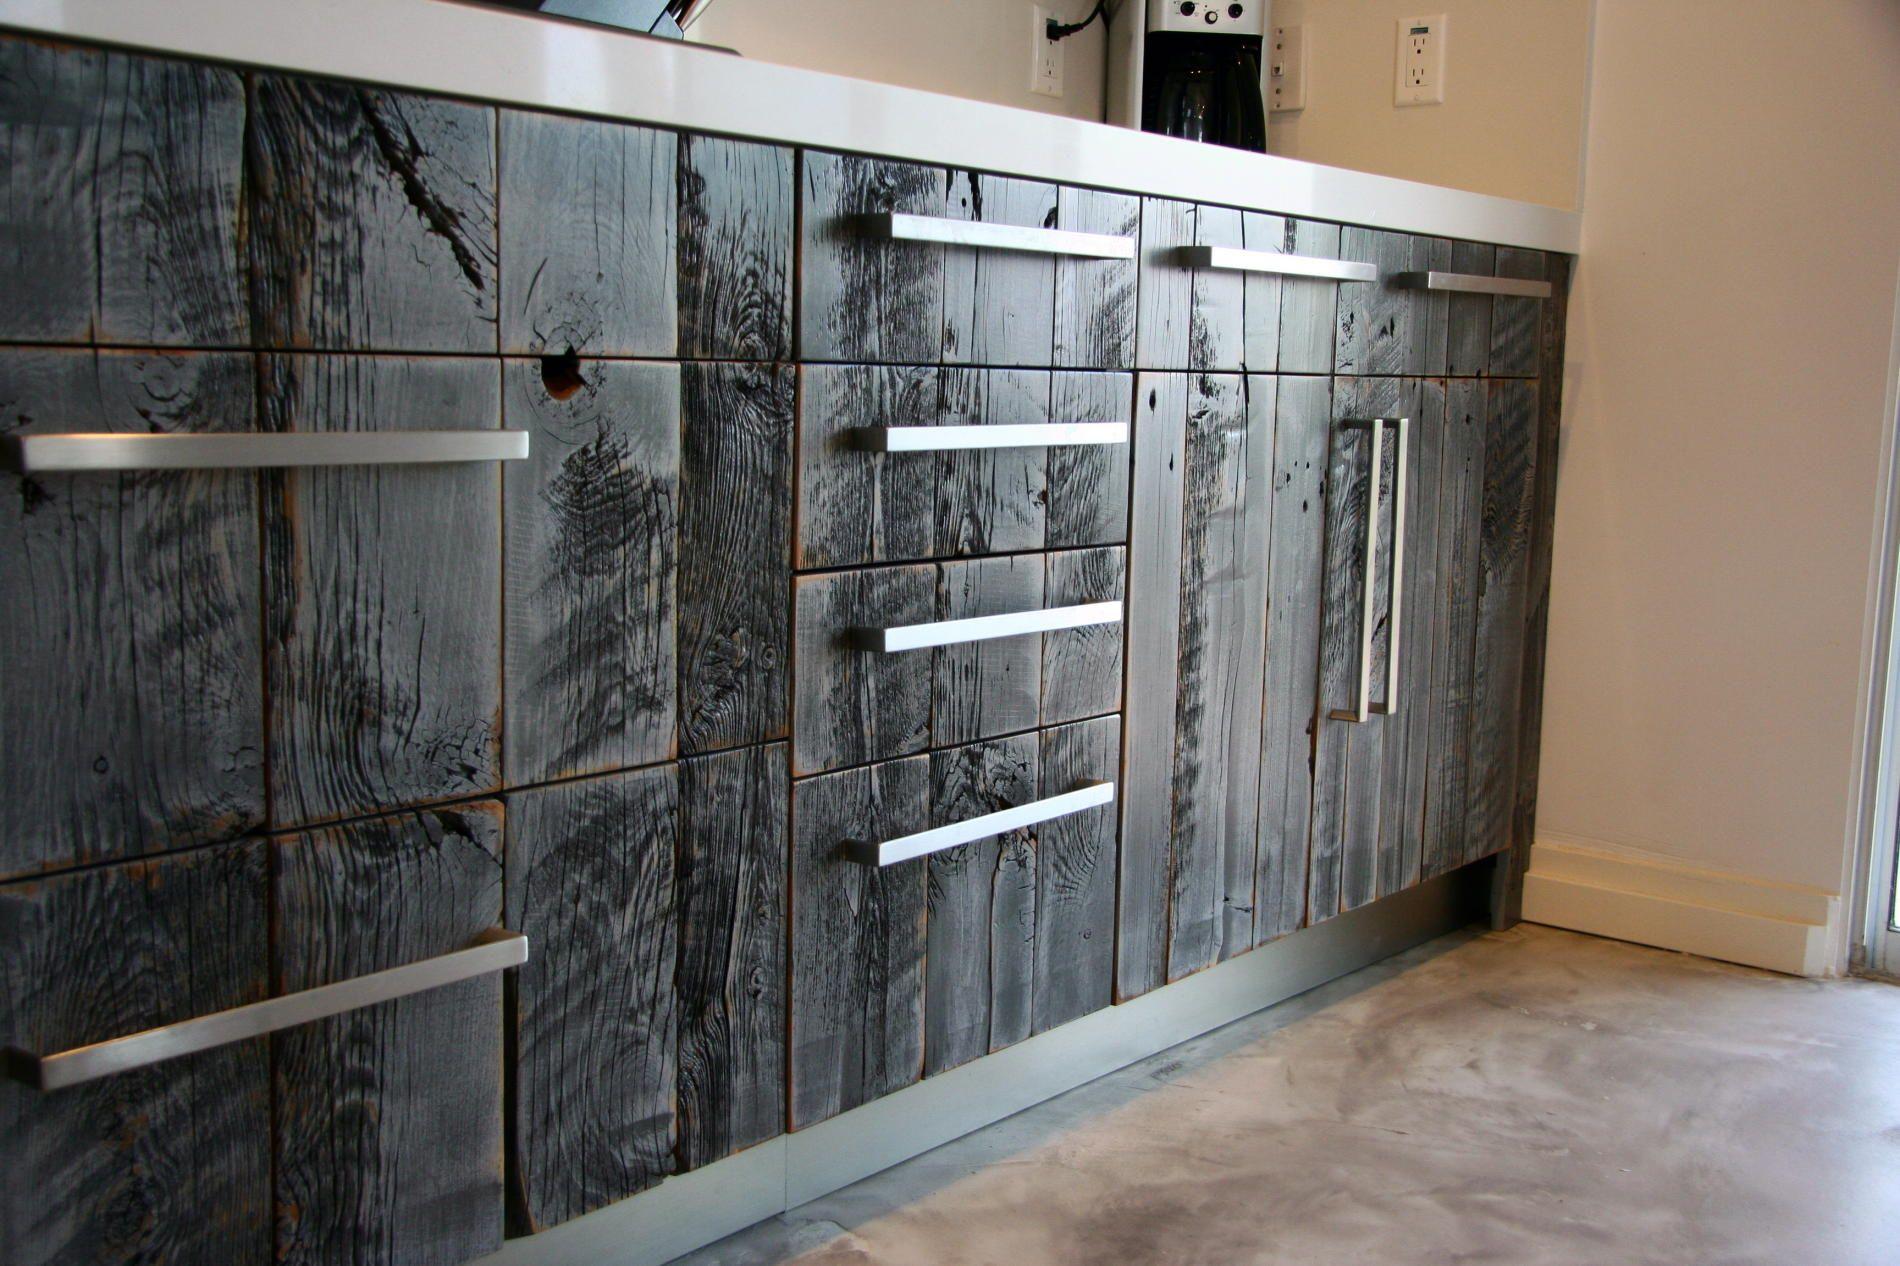 ikea kitchen ideas Semihandmade Semihandmade Custom IKEA Doors I would love a kitchen using recycled timber doors